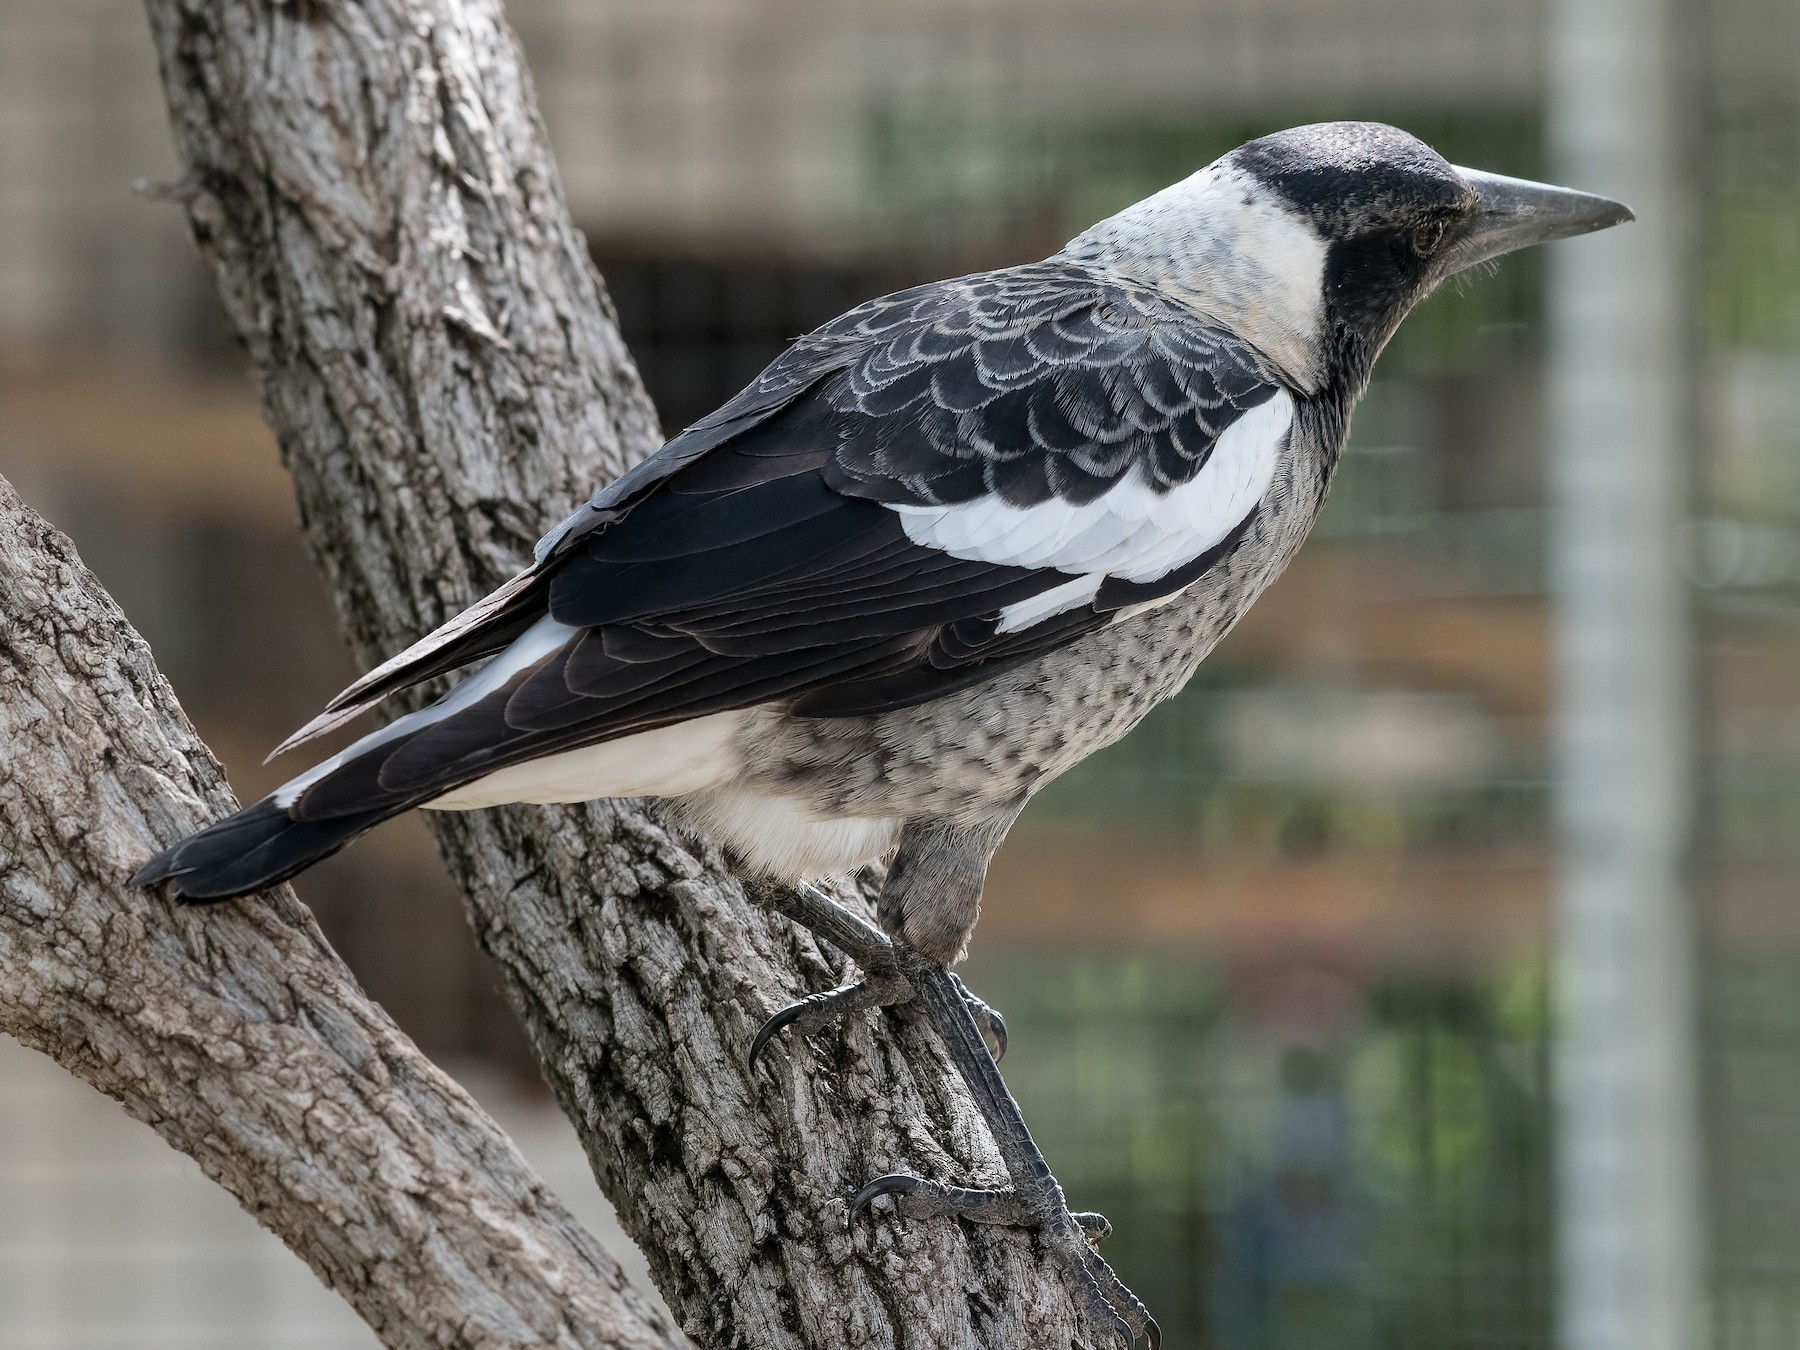 Australian Magpie - Terence Alexander